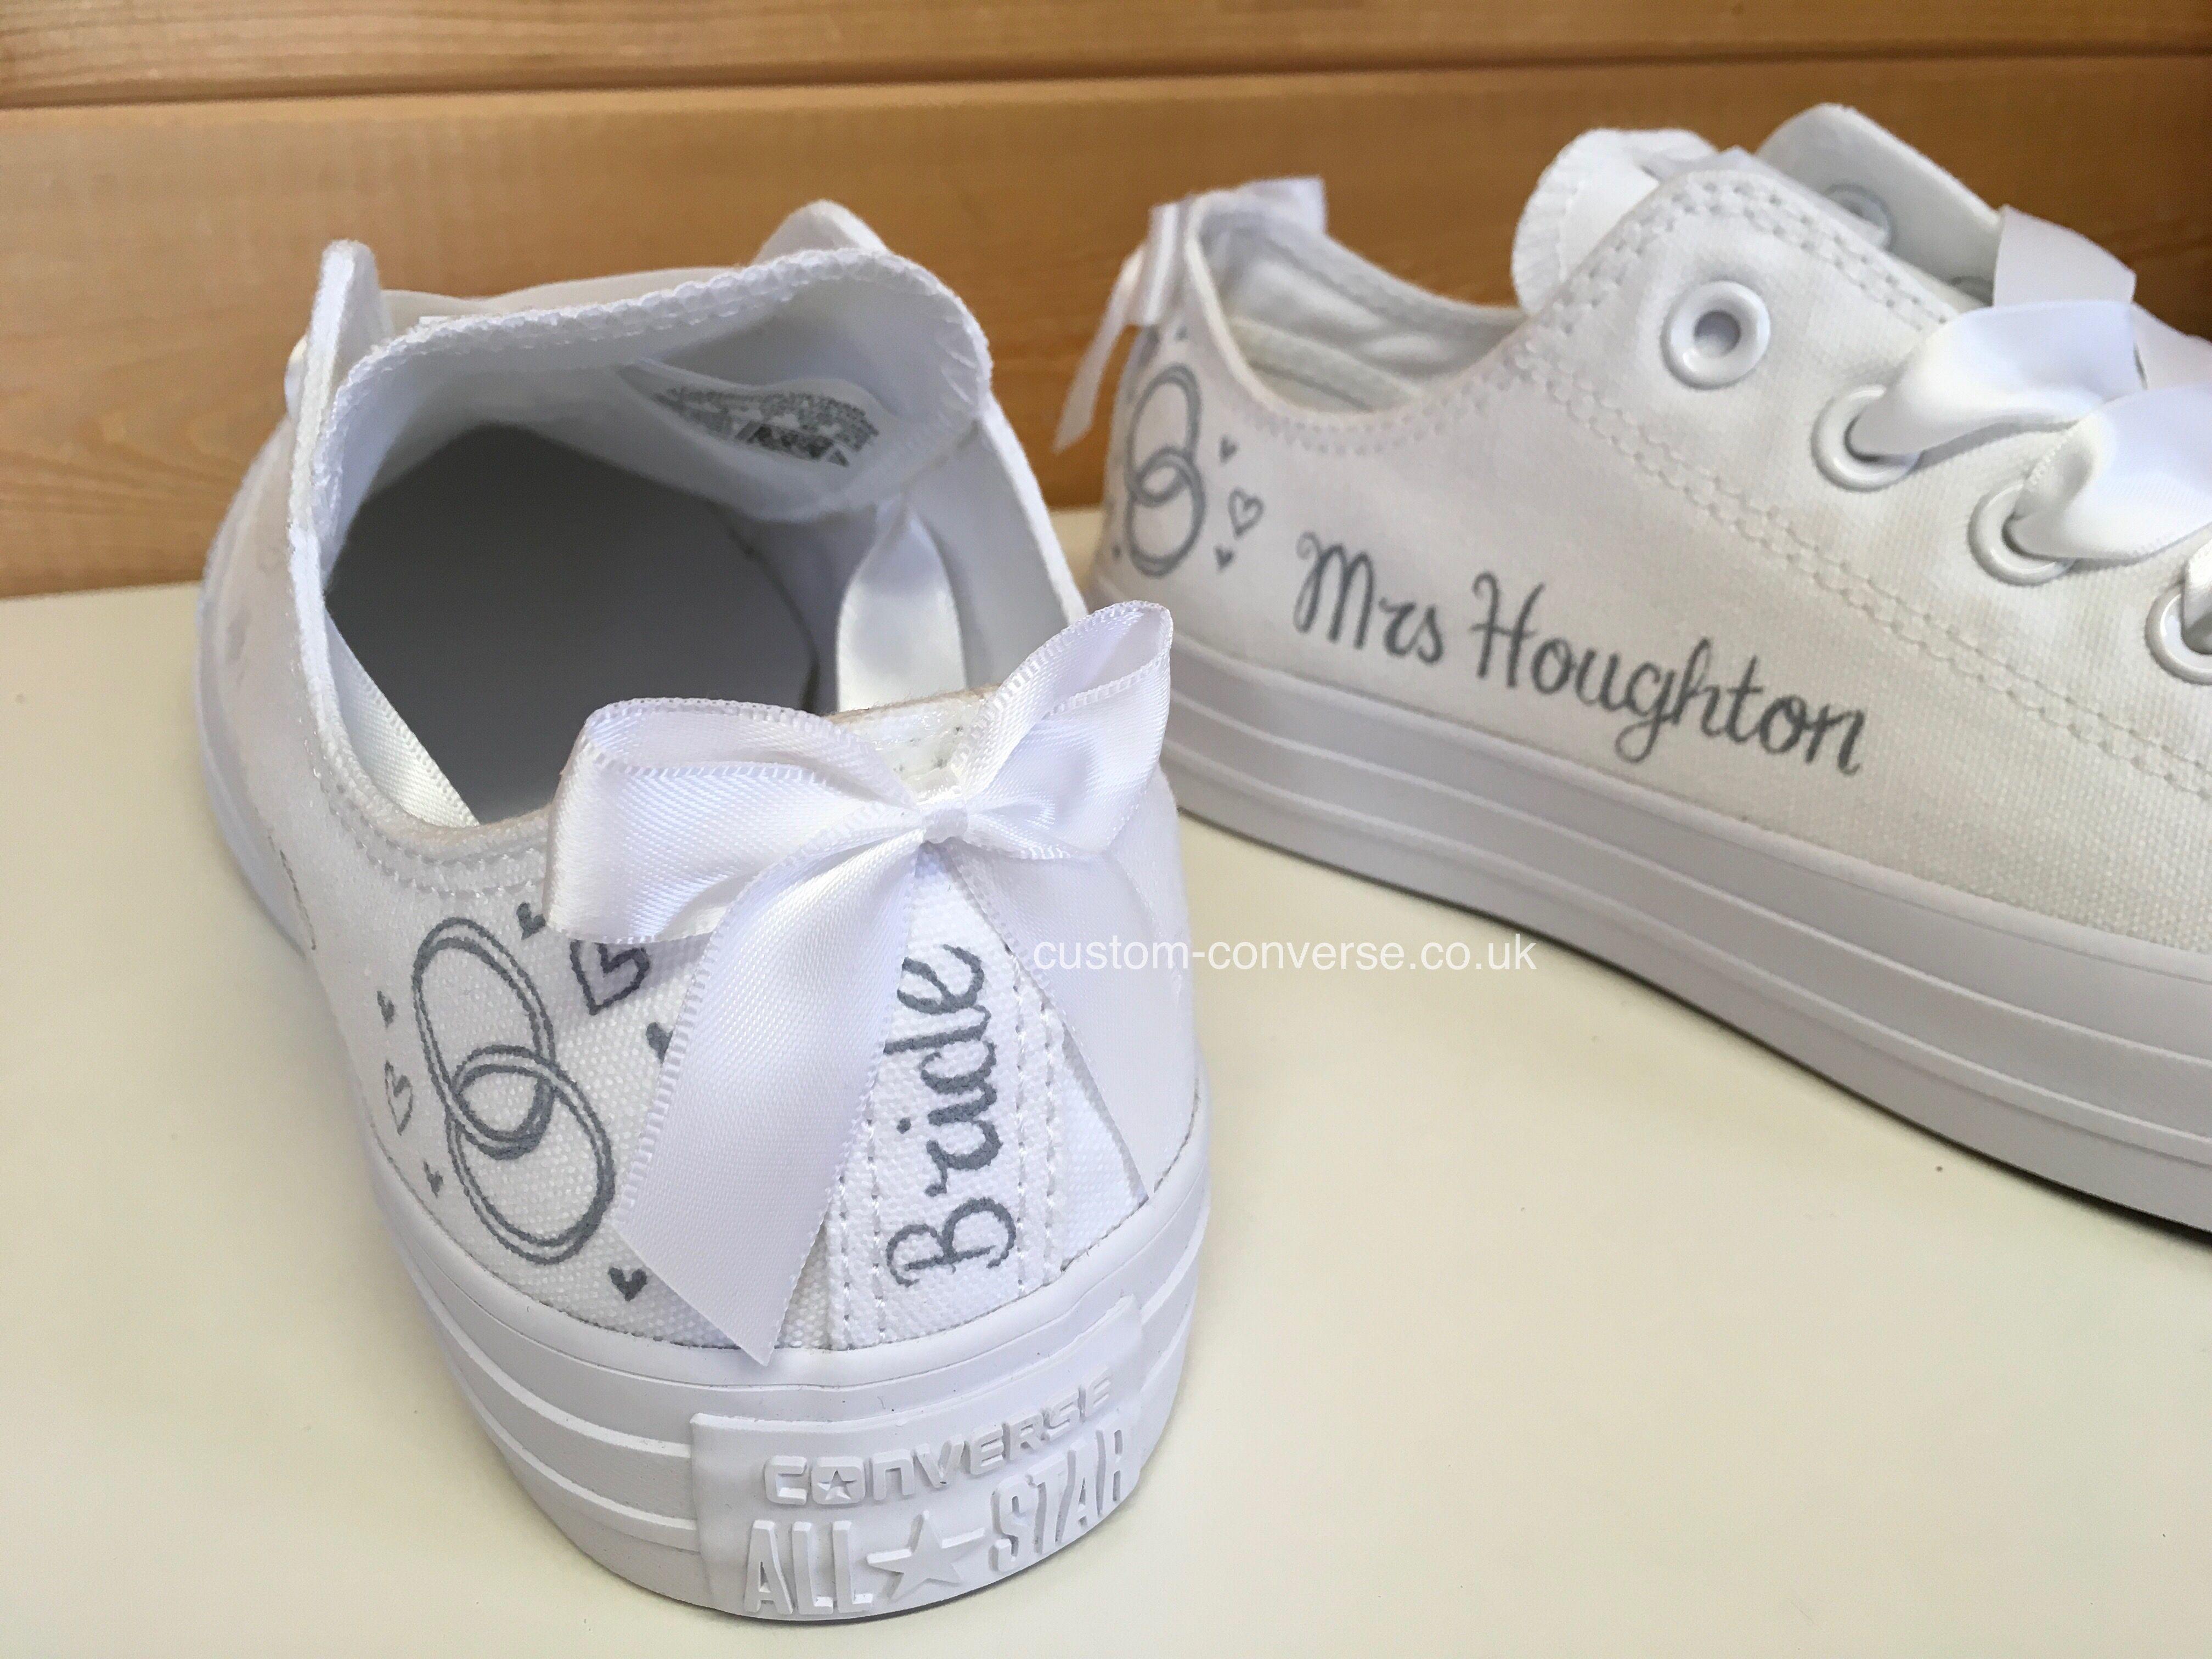 242a53666057c Linked Rings | כלות | Converse wedding shoes, Wedding sneakers ...